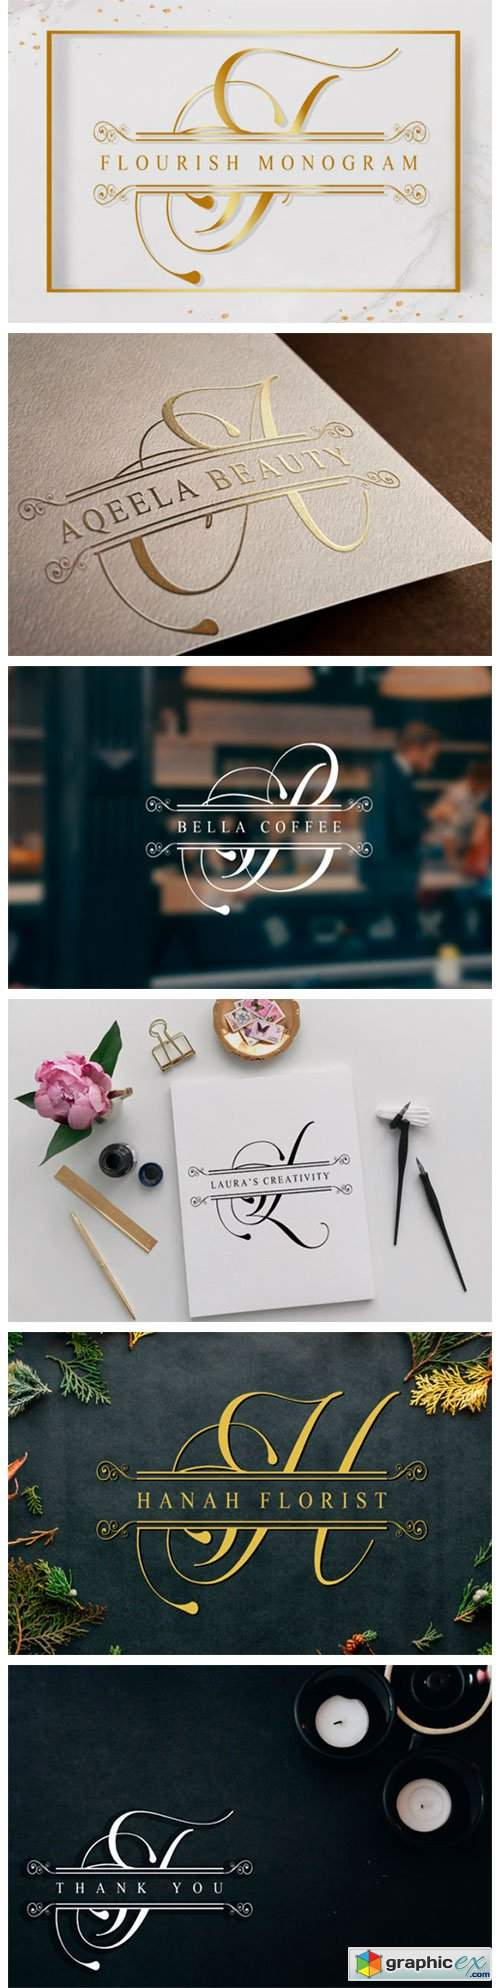 Flourish Monogram Font